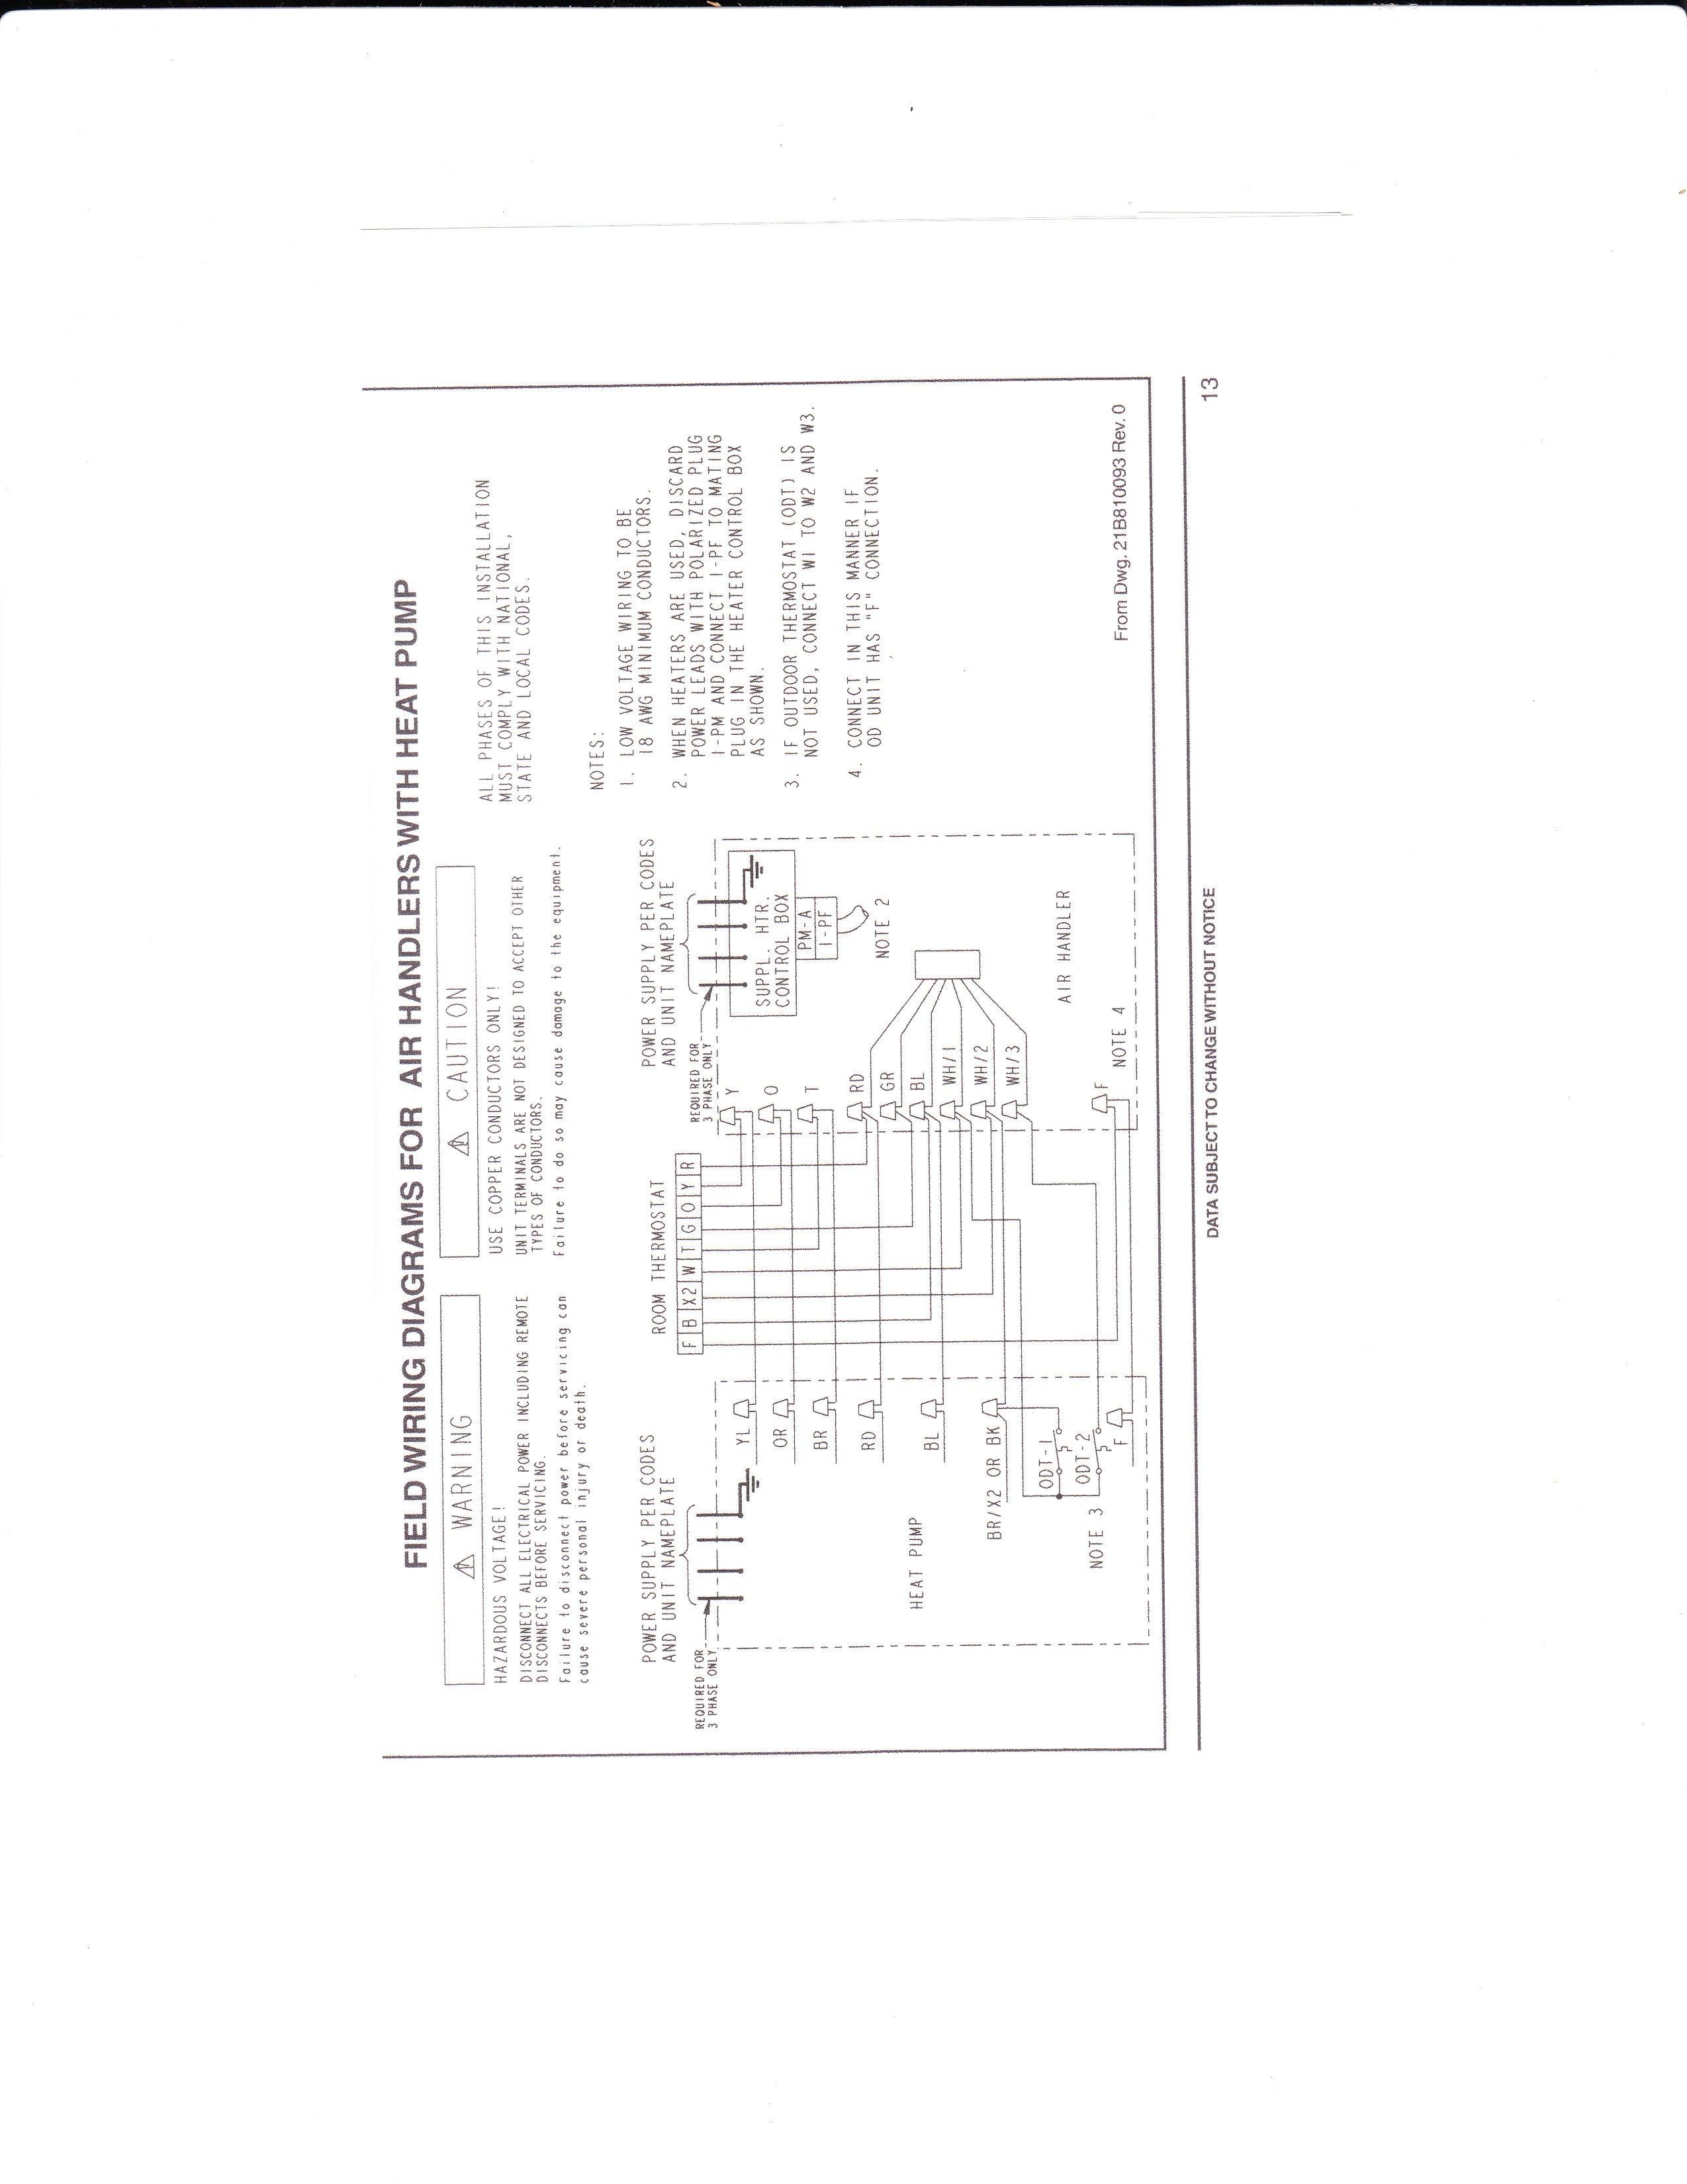 Trane Weathertron Thermostat Wiring